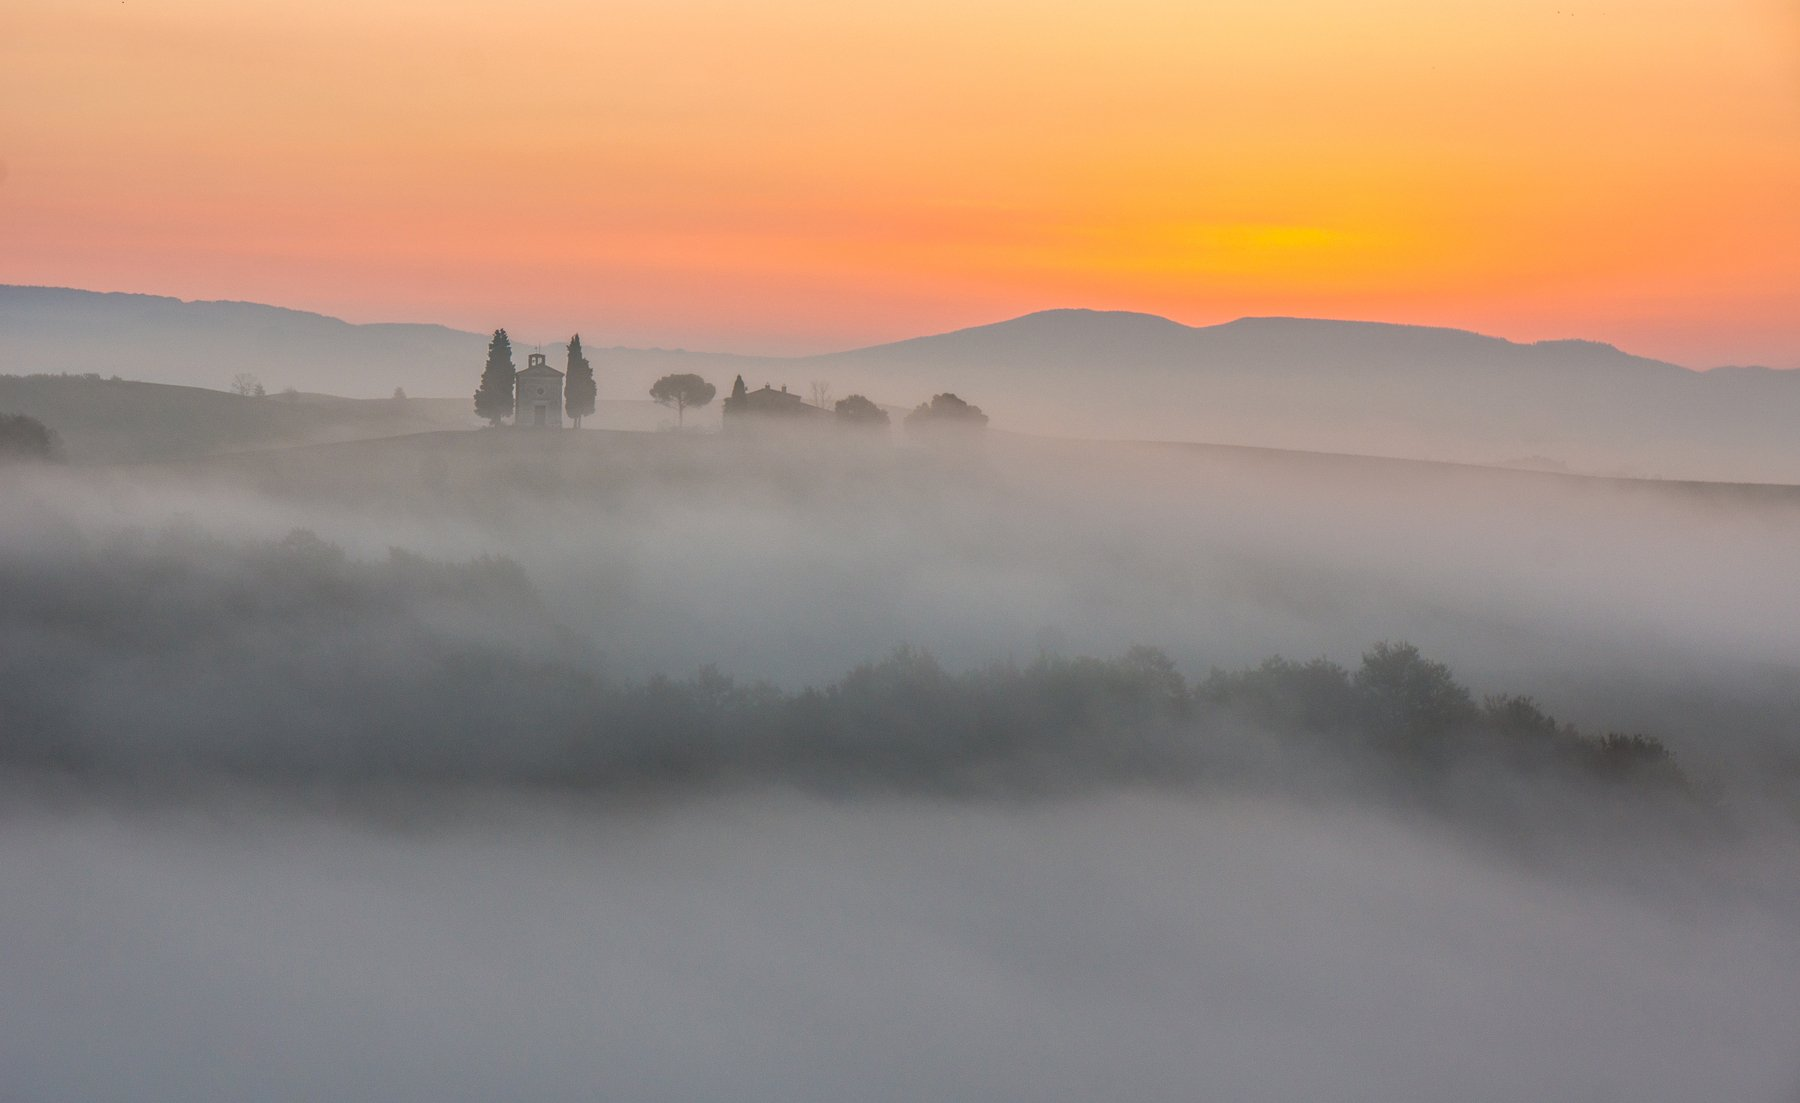 tuscany, nature, morning, fog, landscape, italy, journey, europe, d'orcia тоскана, природа, утро, туман, пейзаж, италия, путешествие, европа, д'орча, Ashot Grigoryan